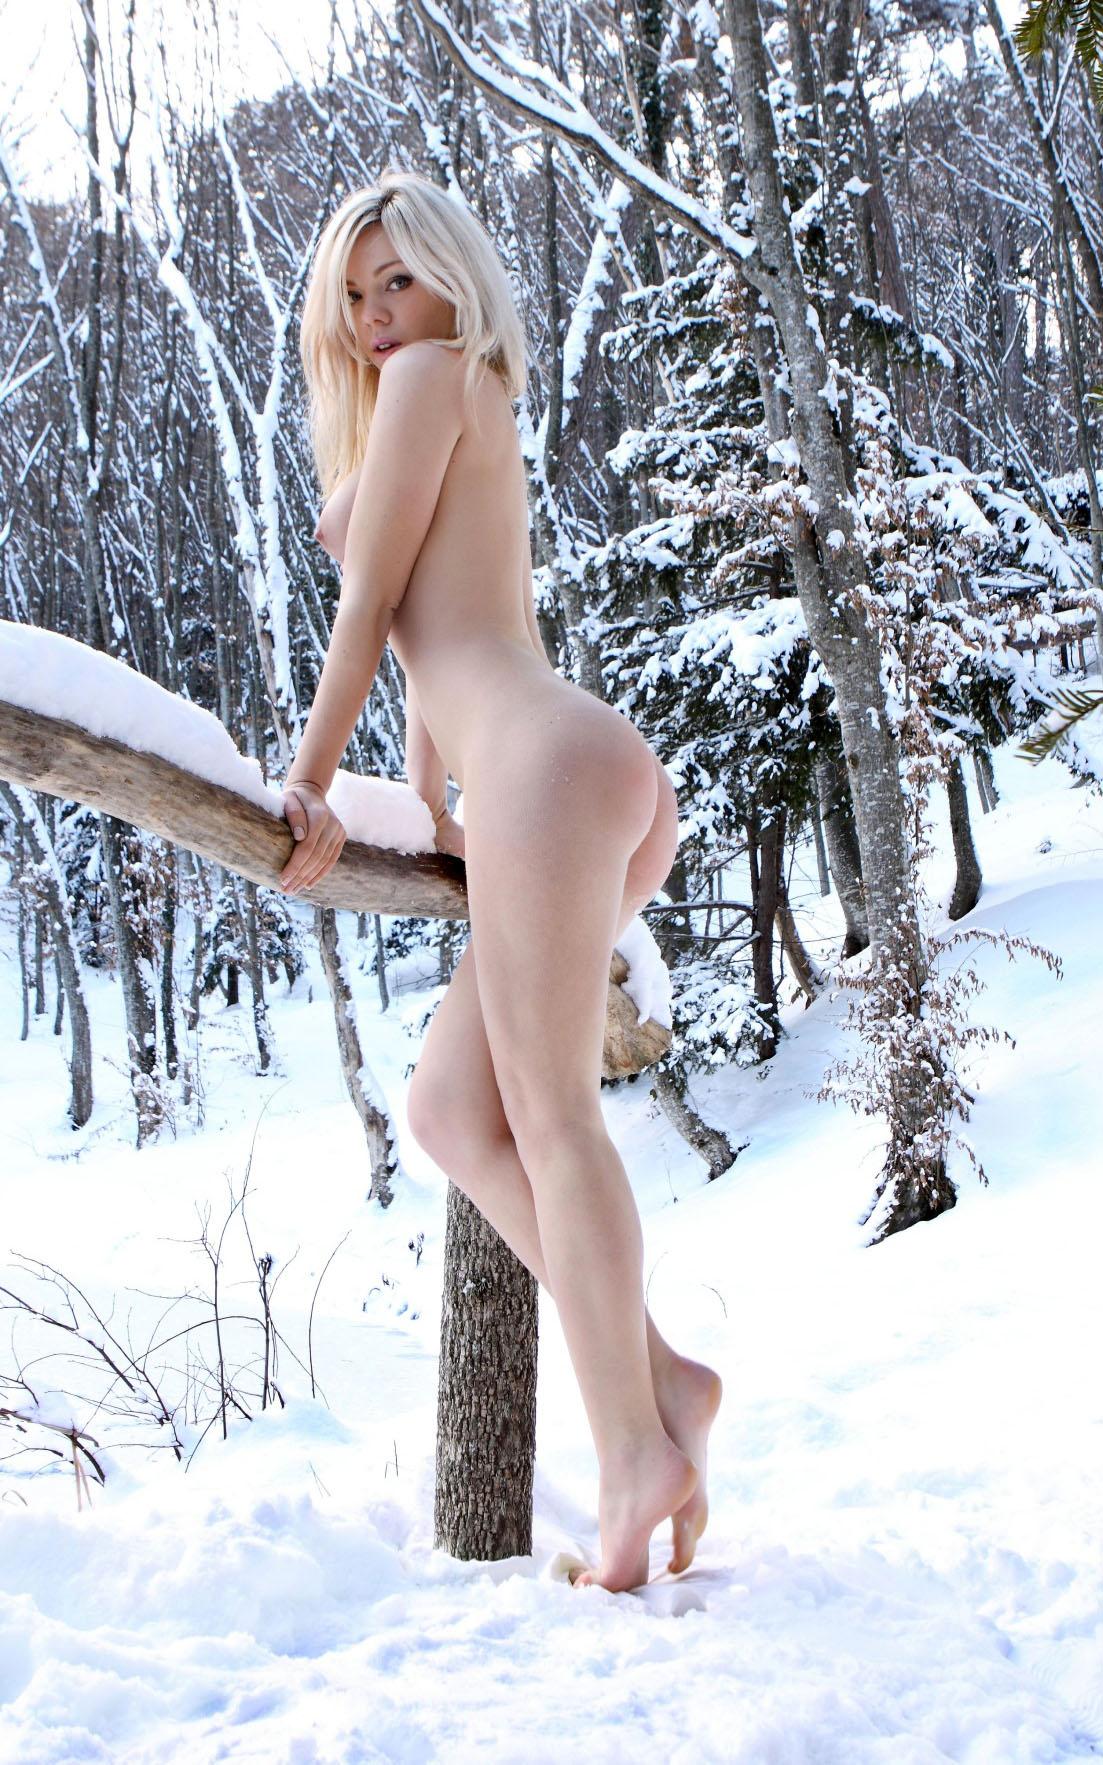 Yvonne zima sexy